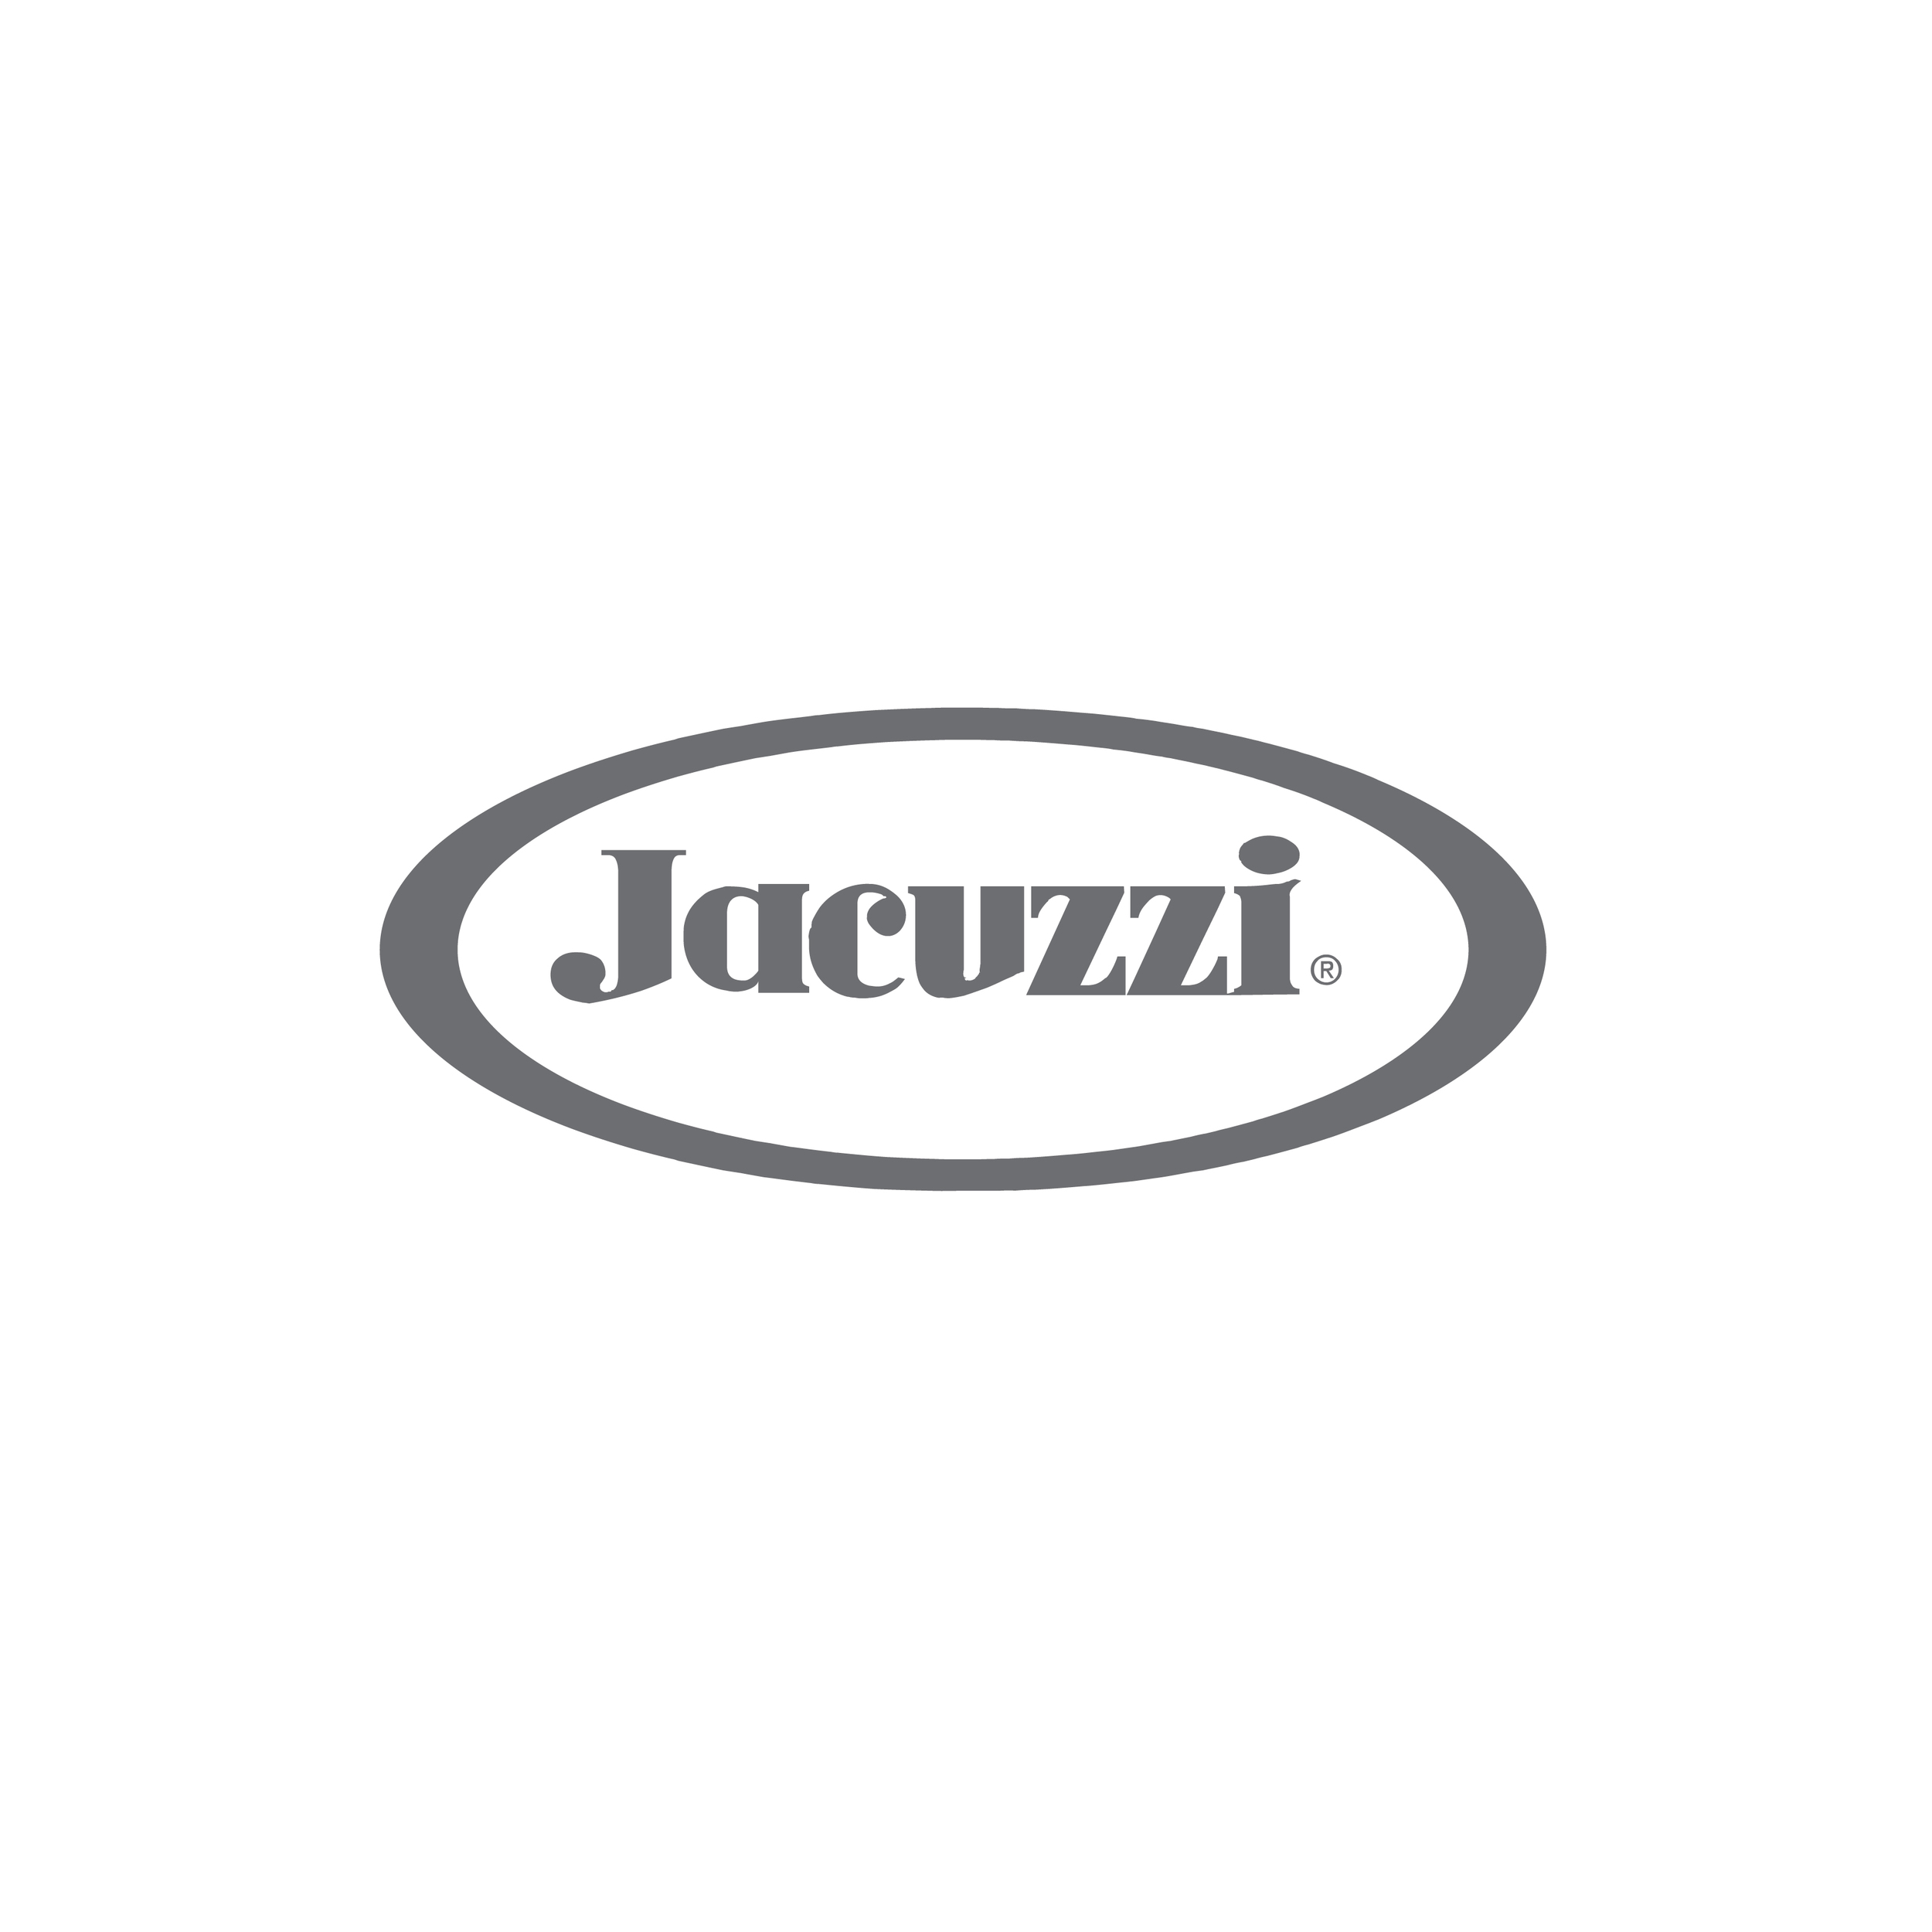 Logo-14-Jacuzzi.jpg